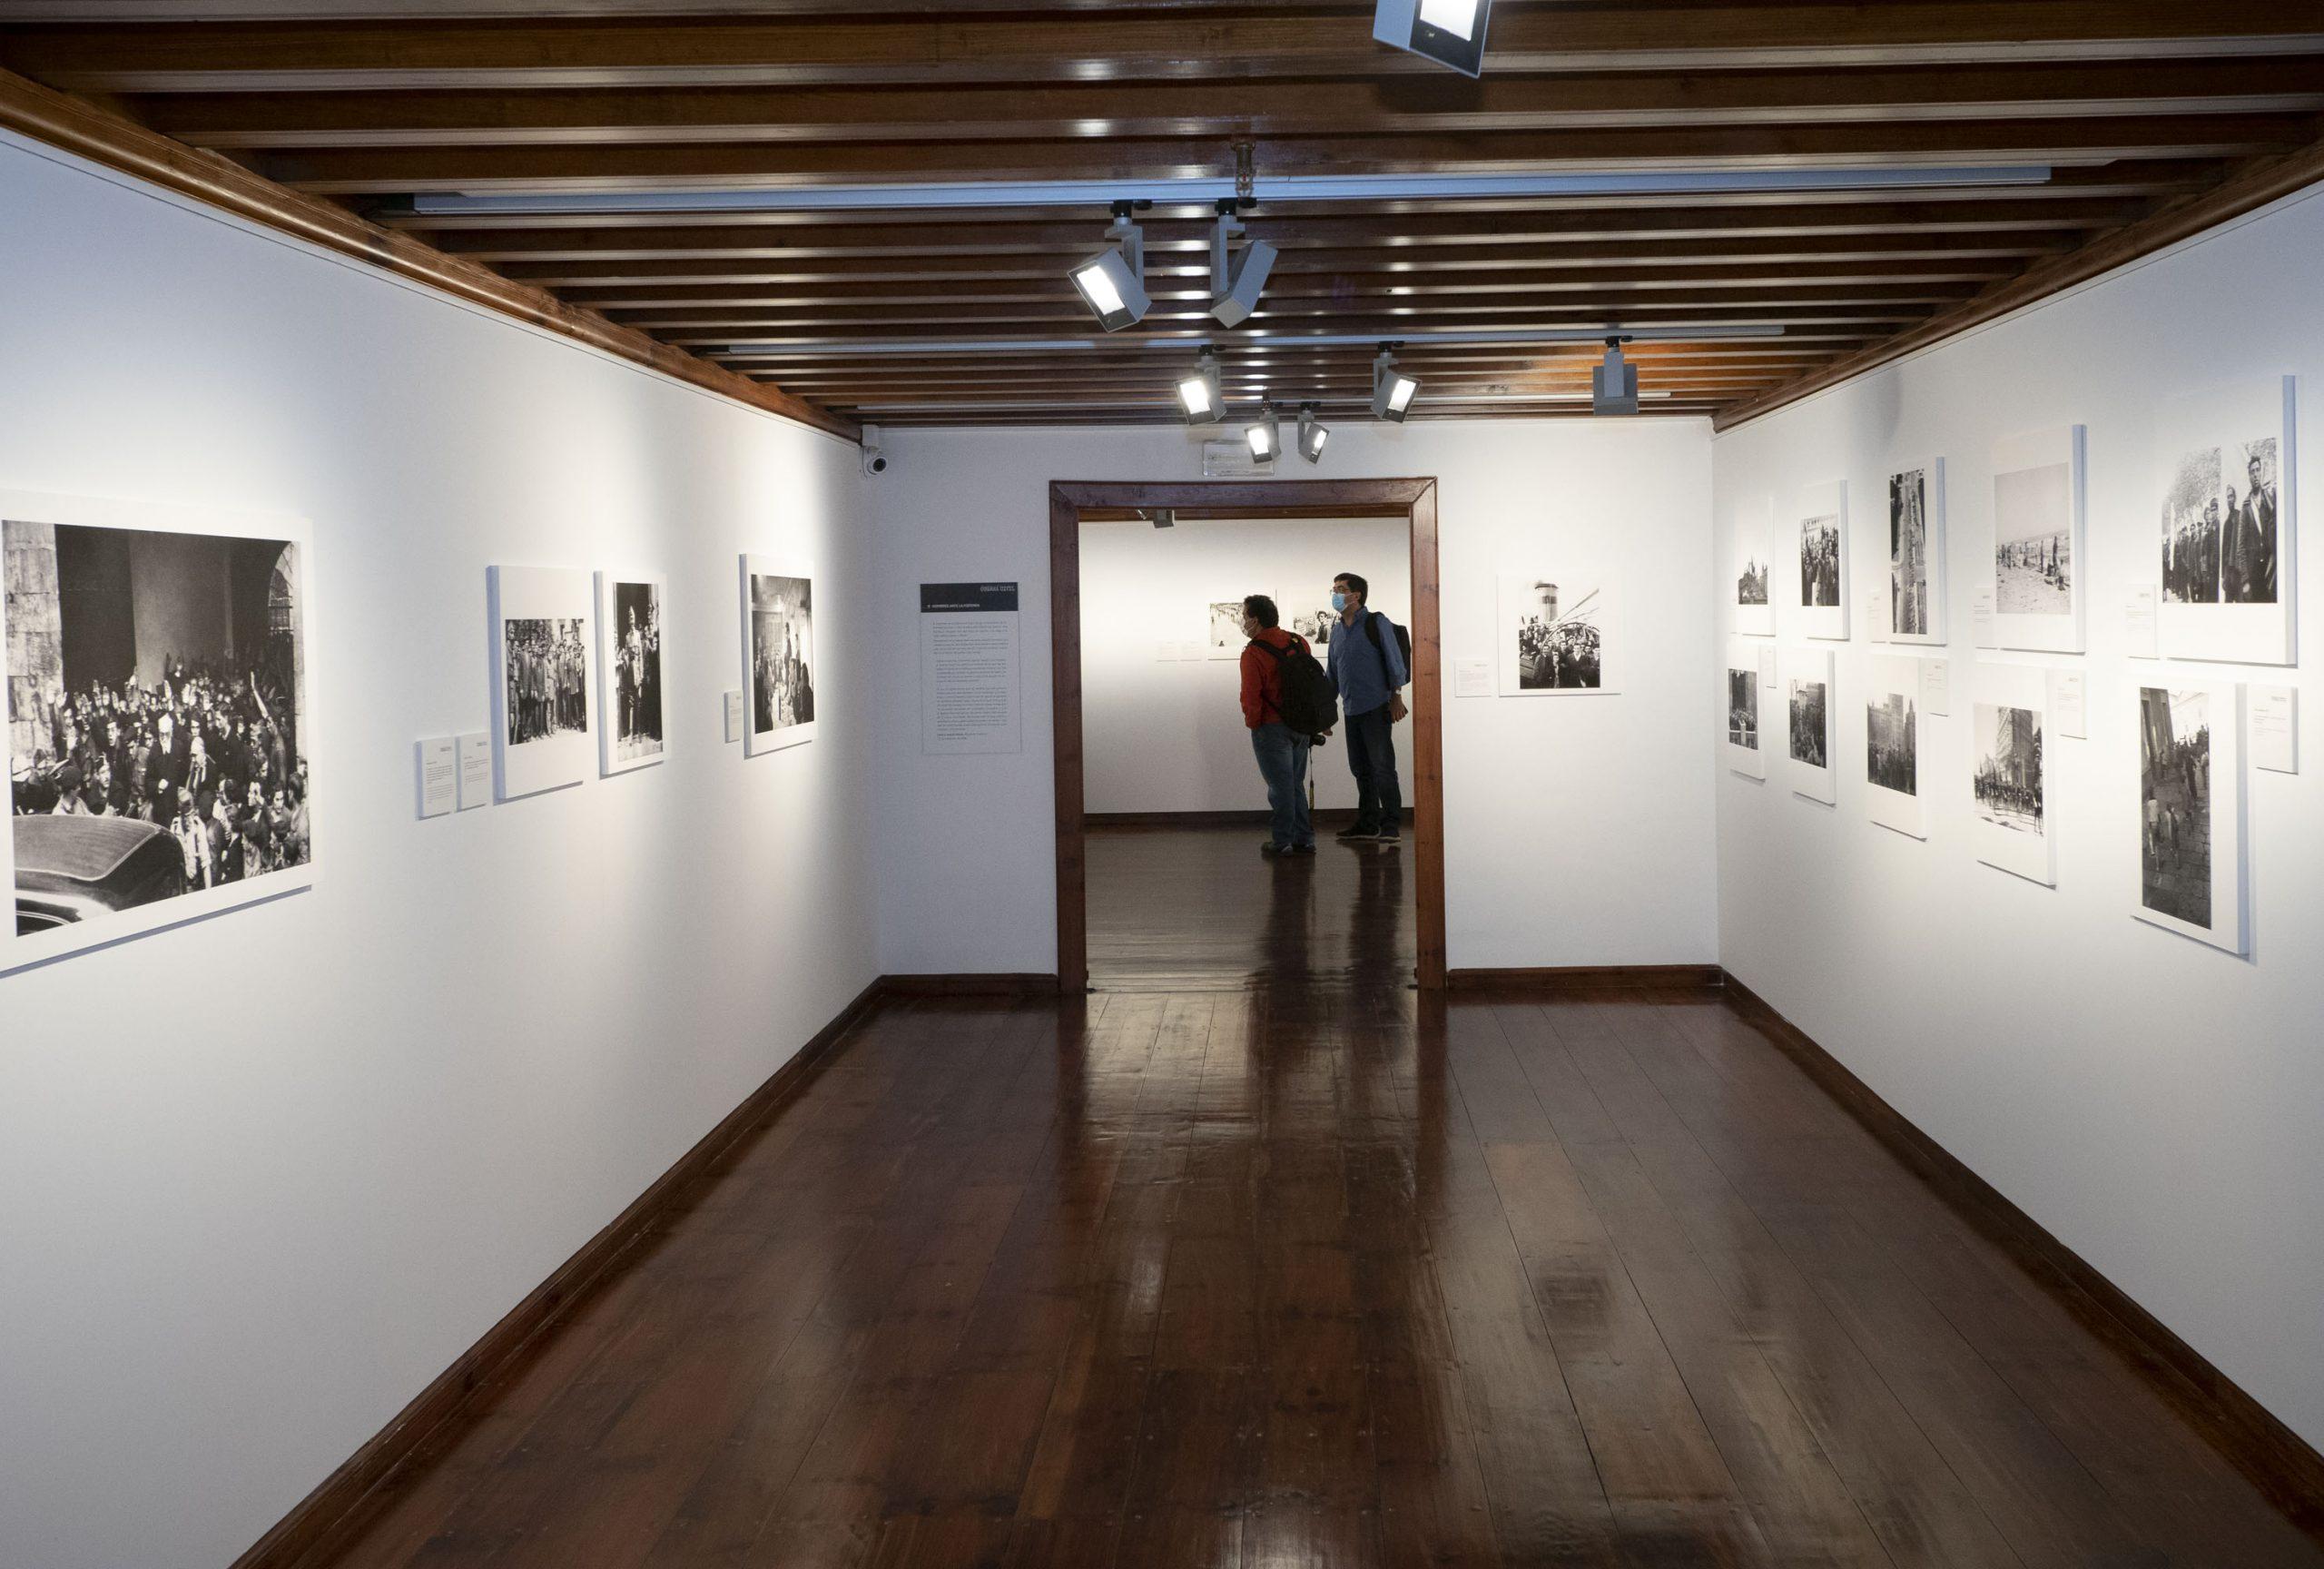 cb Exposicion Imagenes Ineditas de La Guerra Civil09 scaled